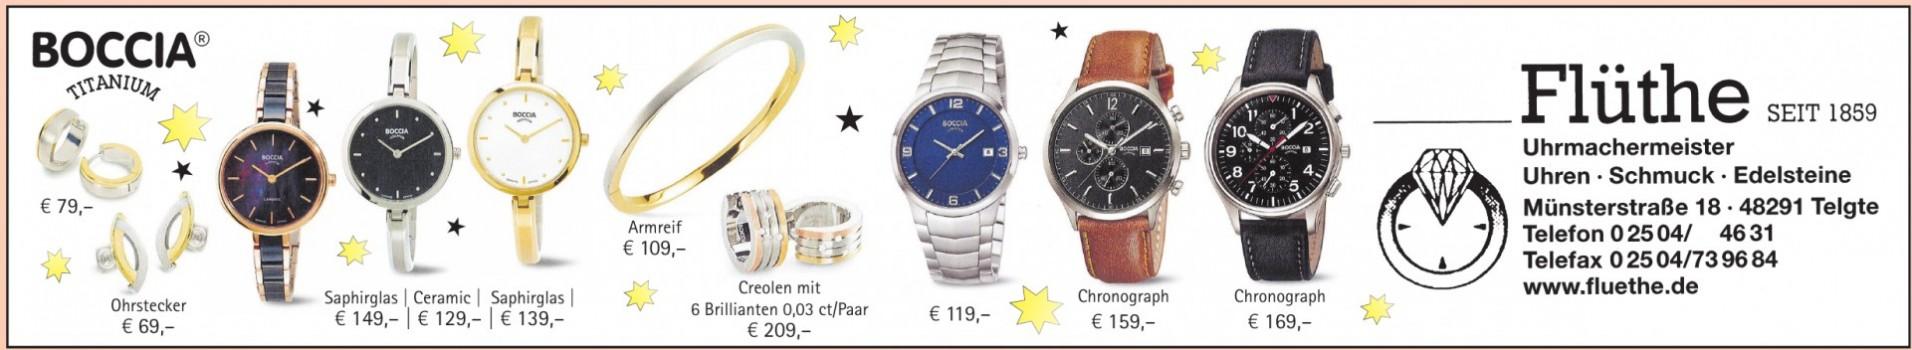 Uhrmachermeister Flüthe